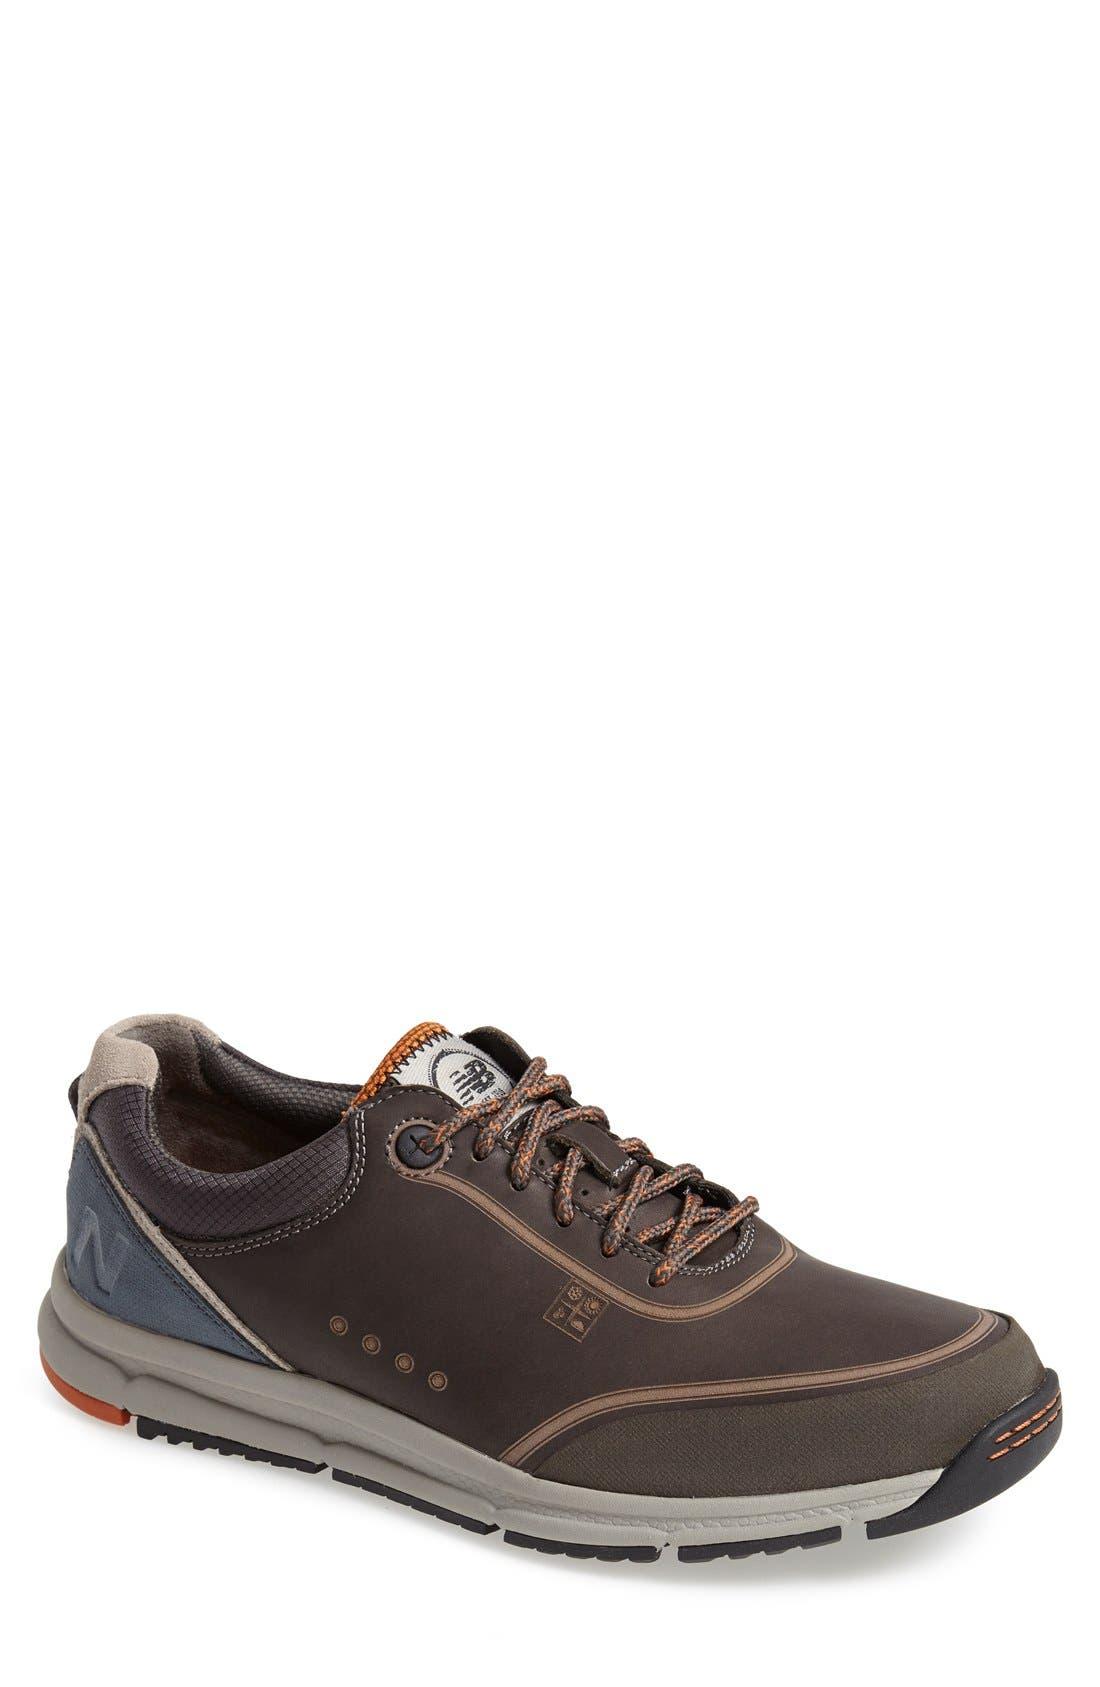 NEW BALANCE '983' Walking Shoe, Main, color, 225